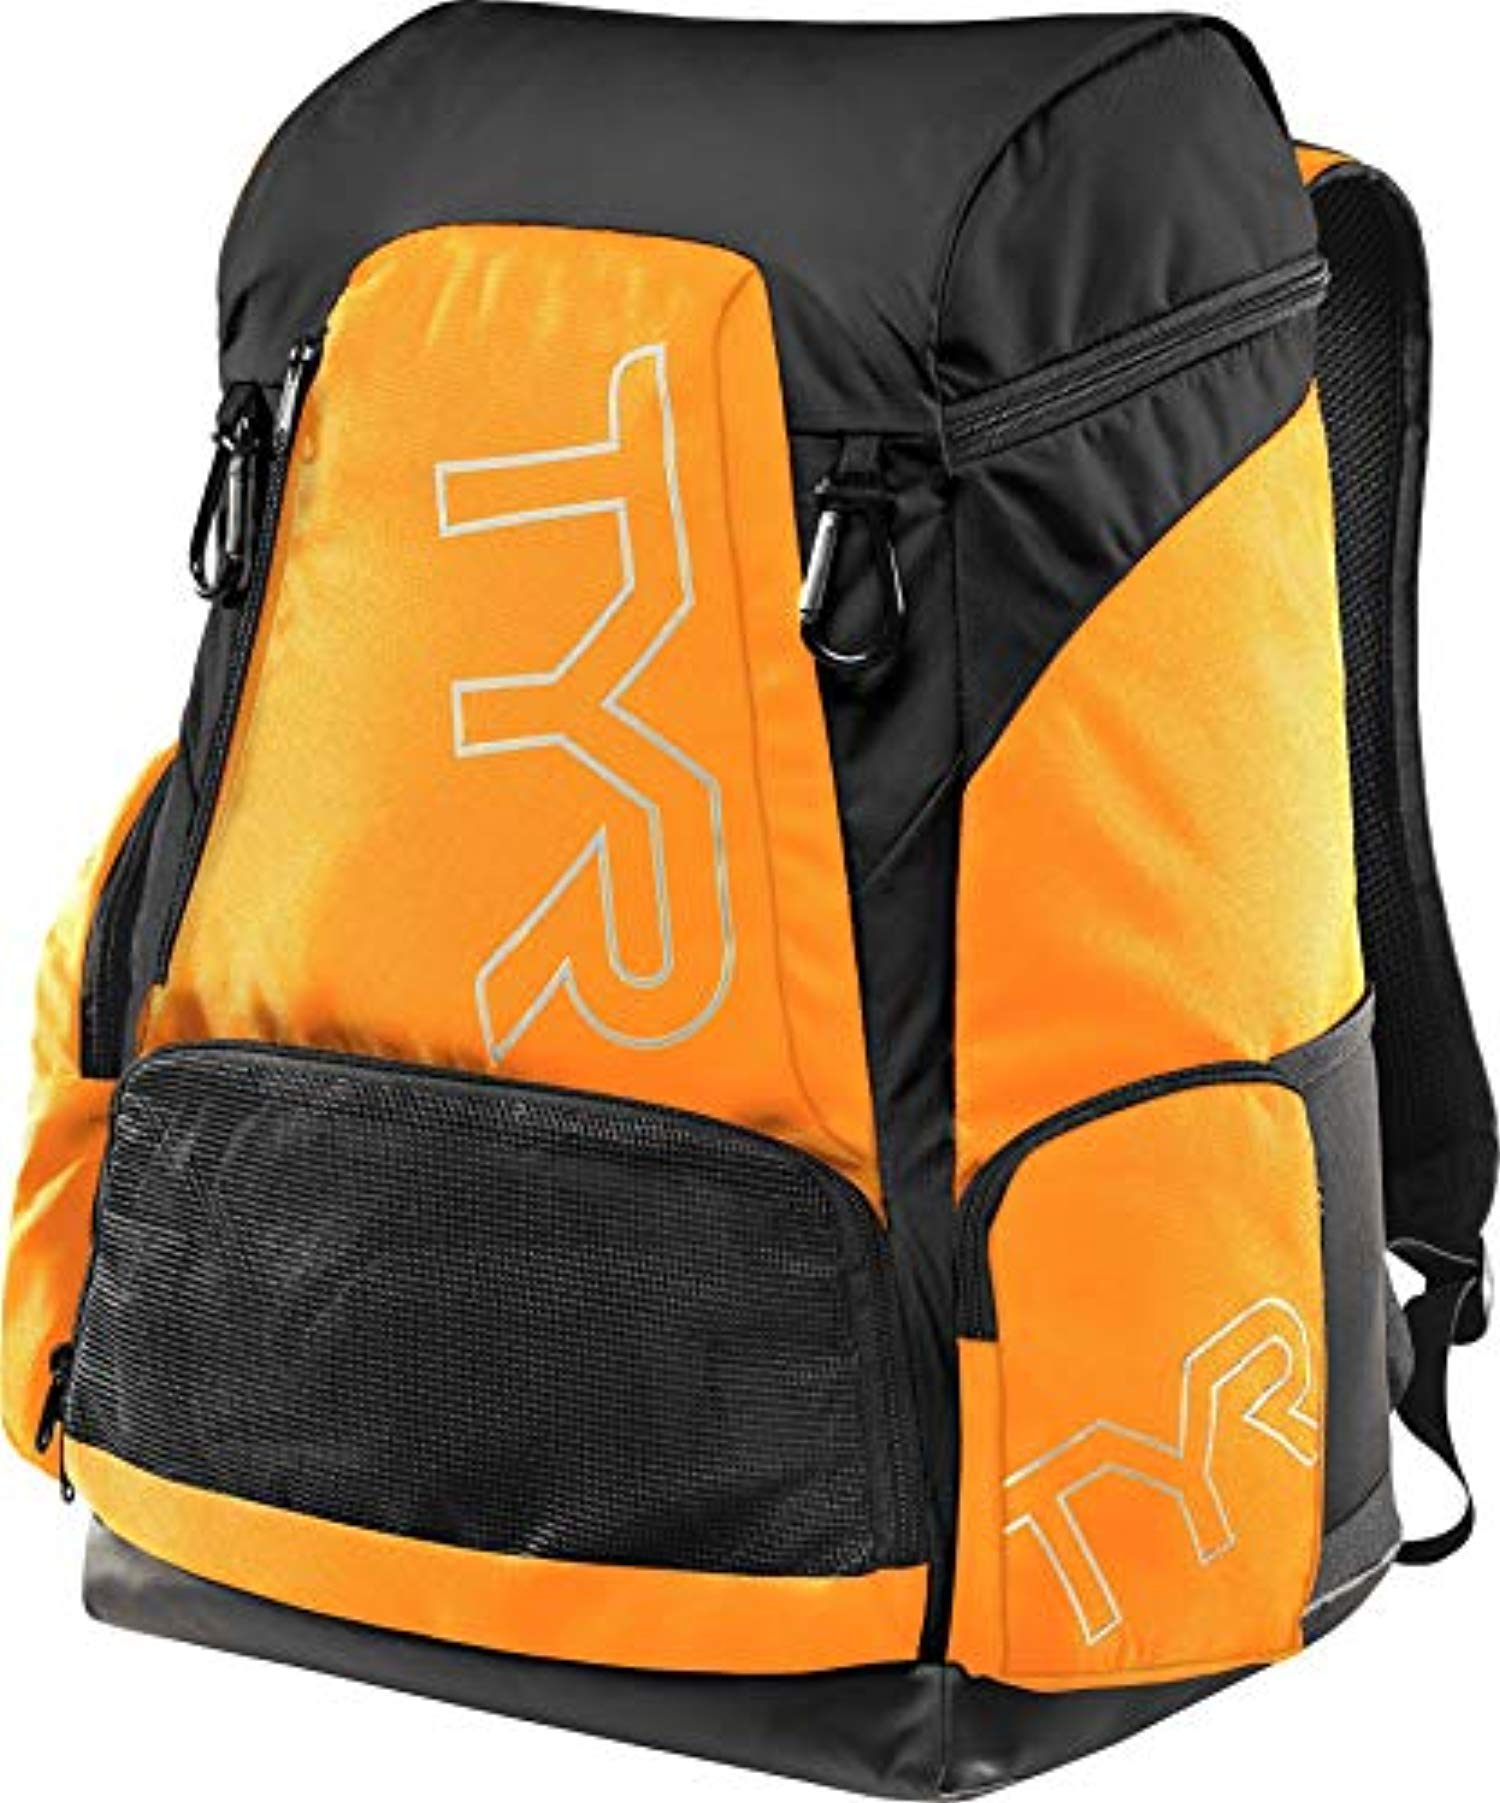 Swim Bundle: TYR Alliance 45L Backpack Fluorescent Orange All & Swim Earplugs by Competition Swimwear